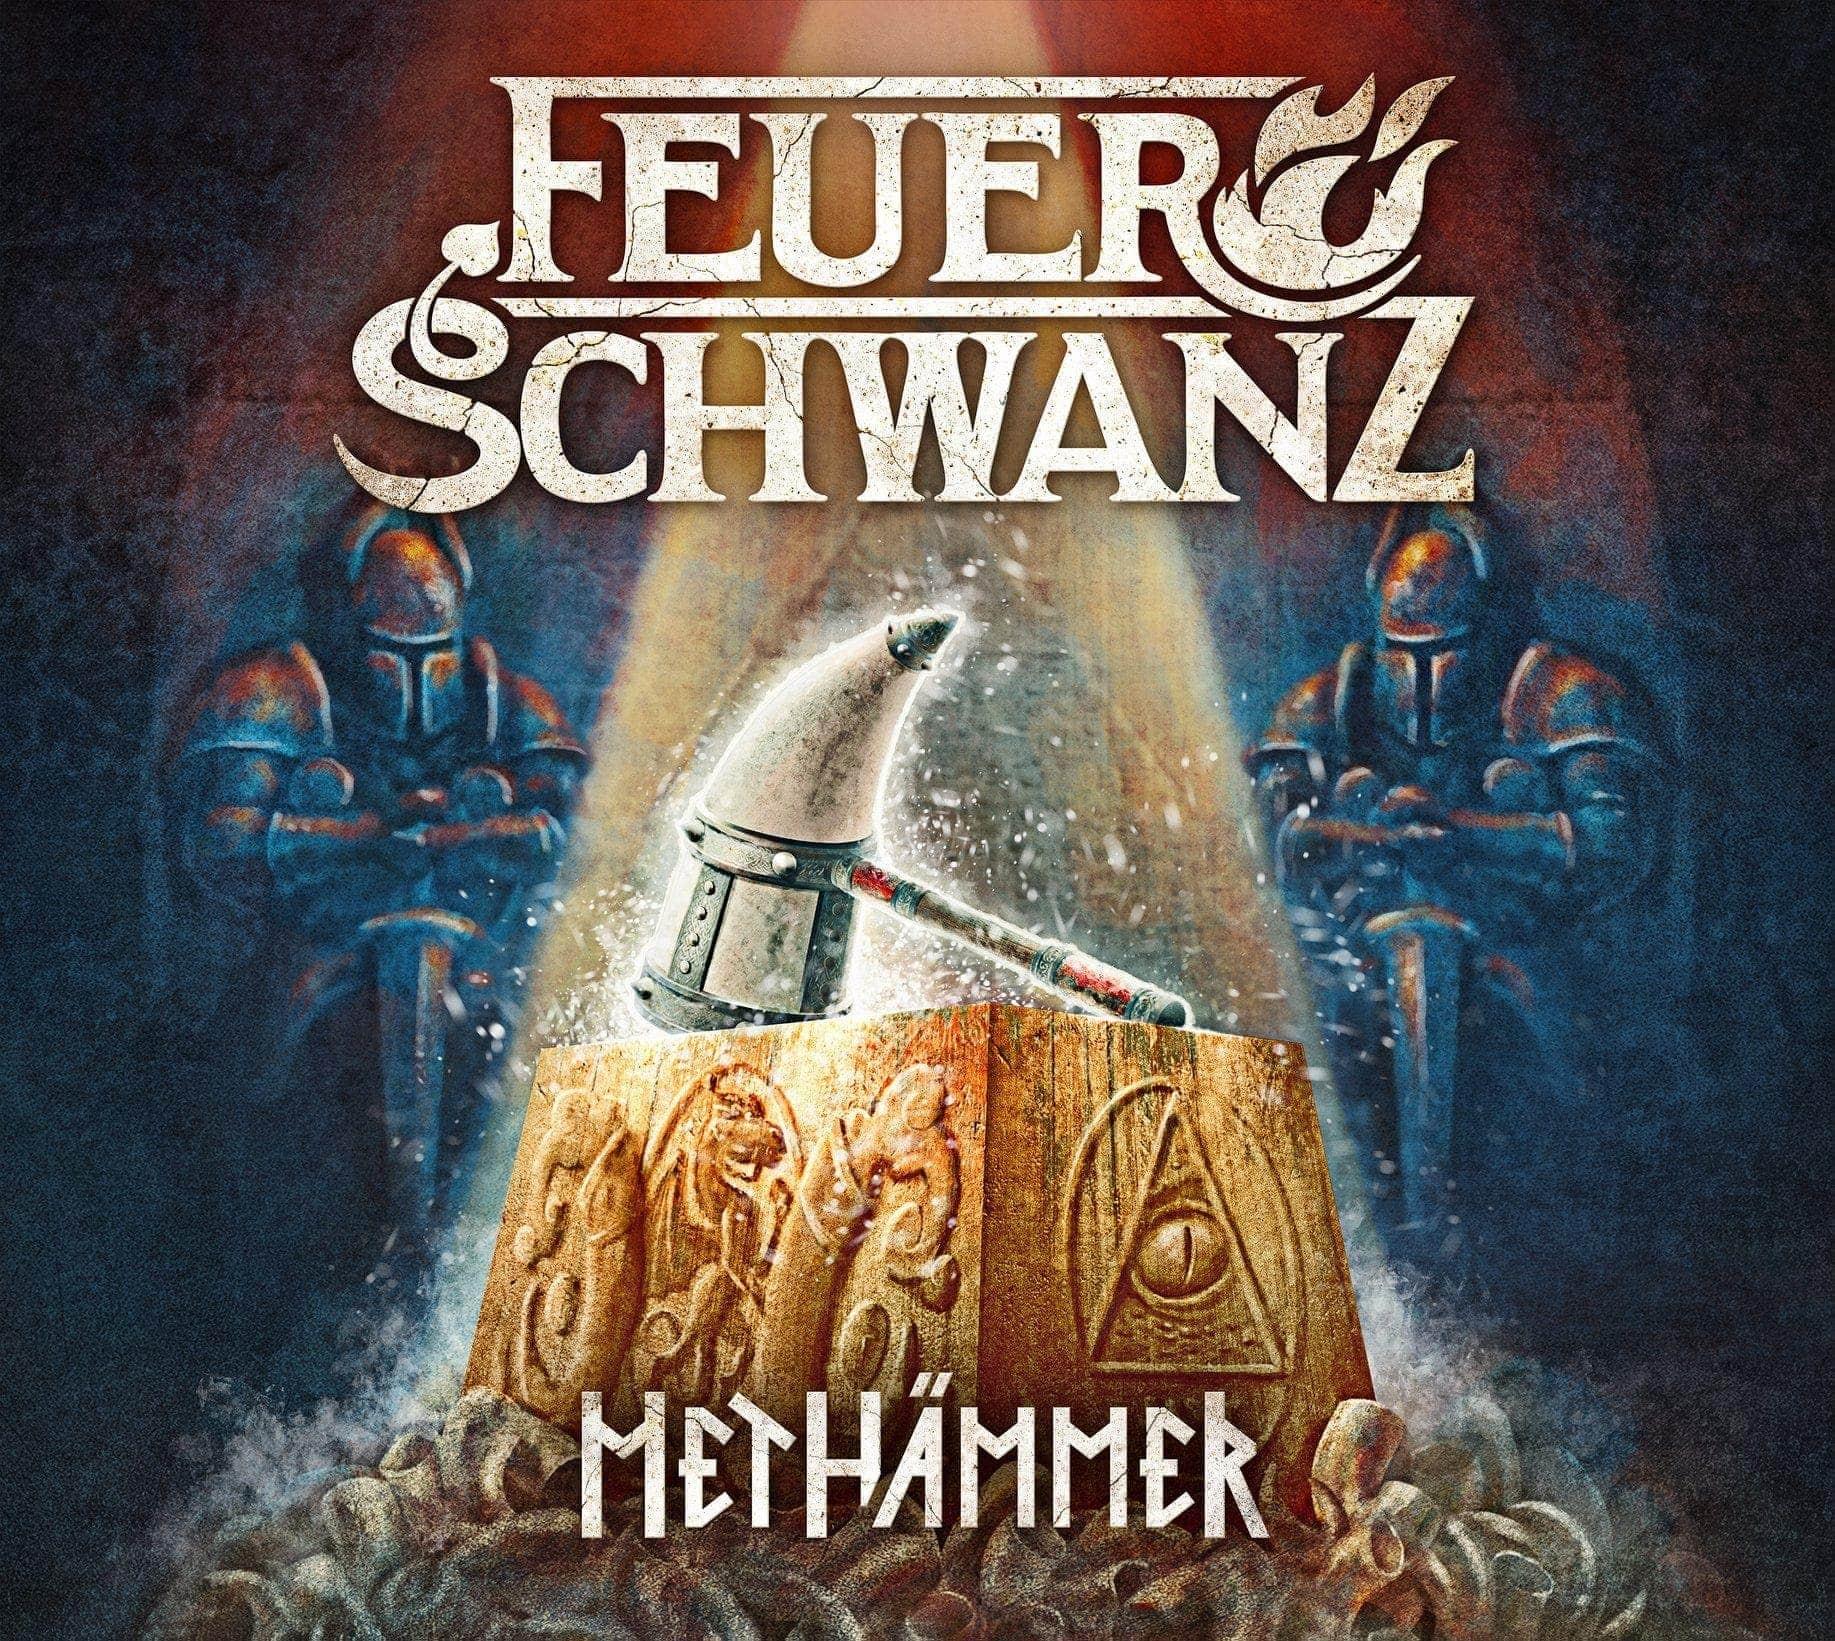 Rezension: Feuerschwanz – Methämmer